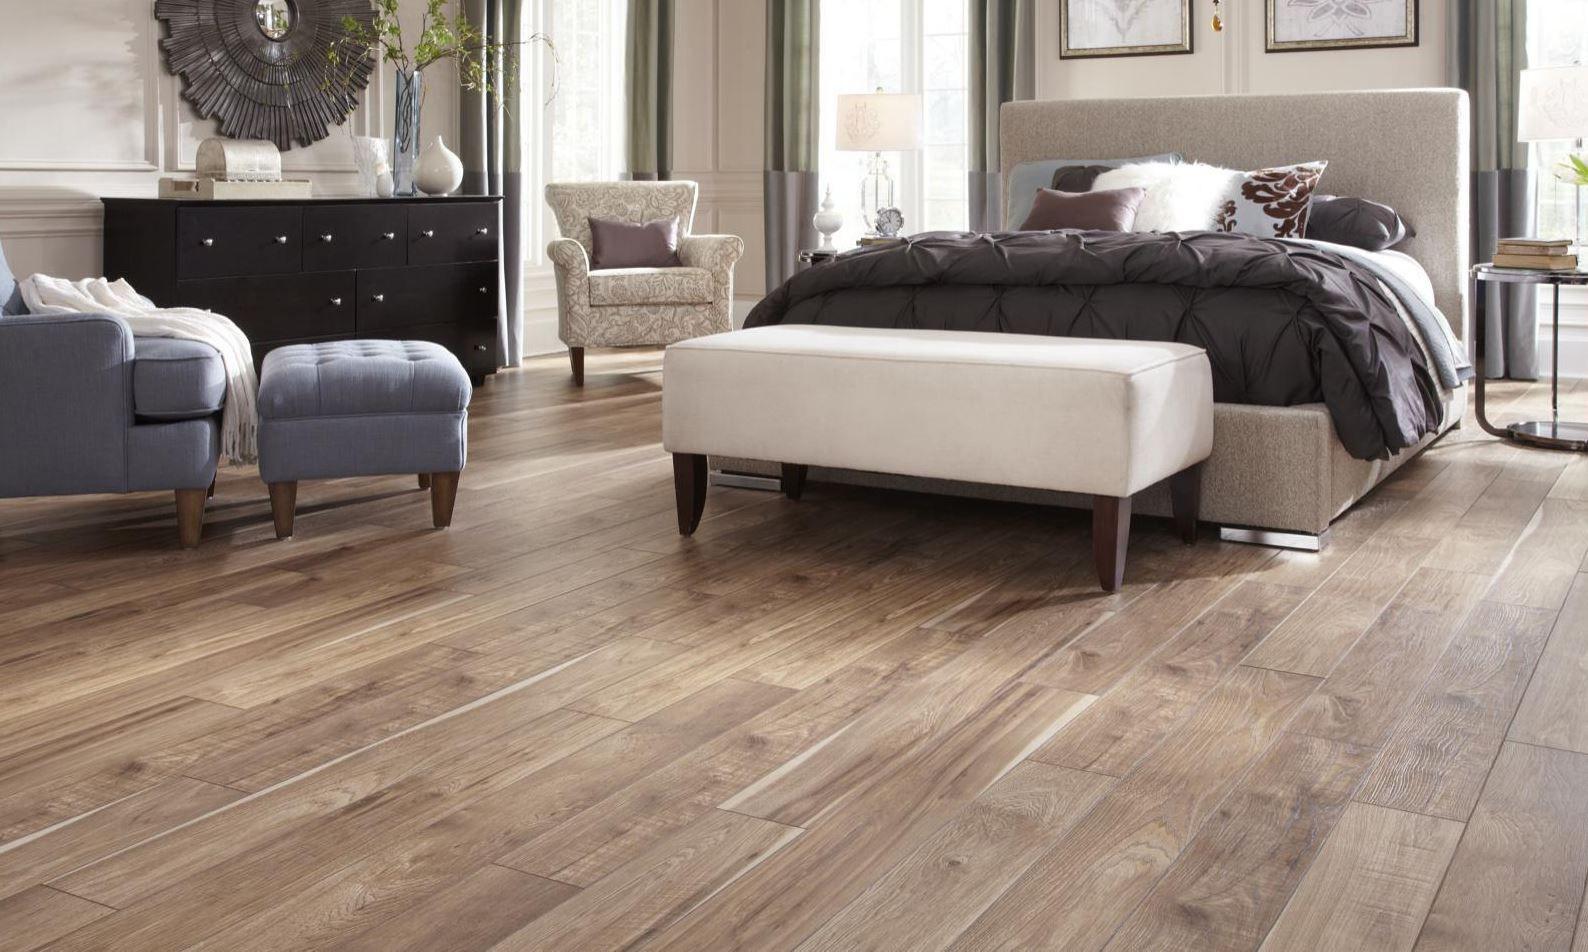 hand scraped hardwood flooring canada of luxury vinyl tile and plank flooring companies for mannington adura luxury vinyl plank flooring 57aa7d065f9b58974a2be49e jpg